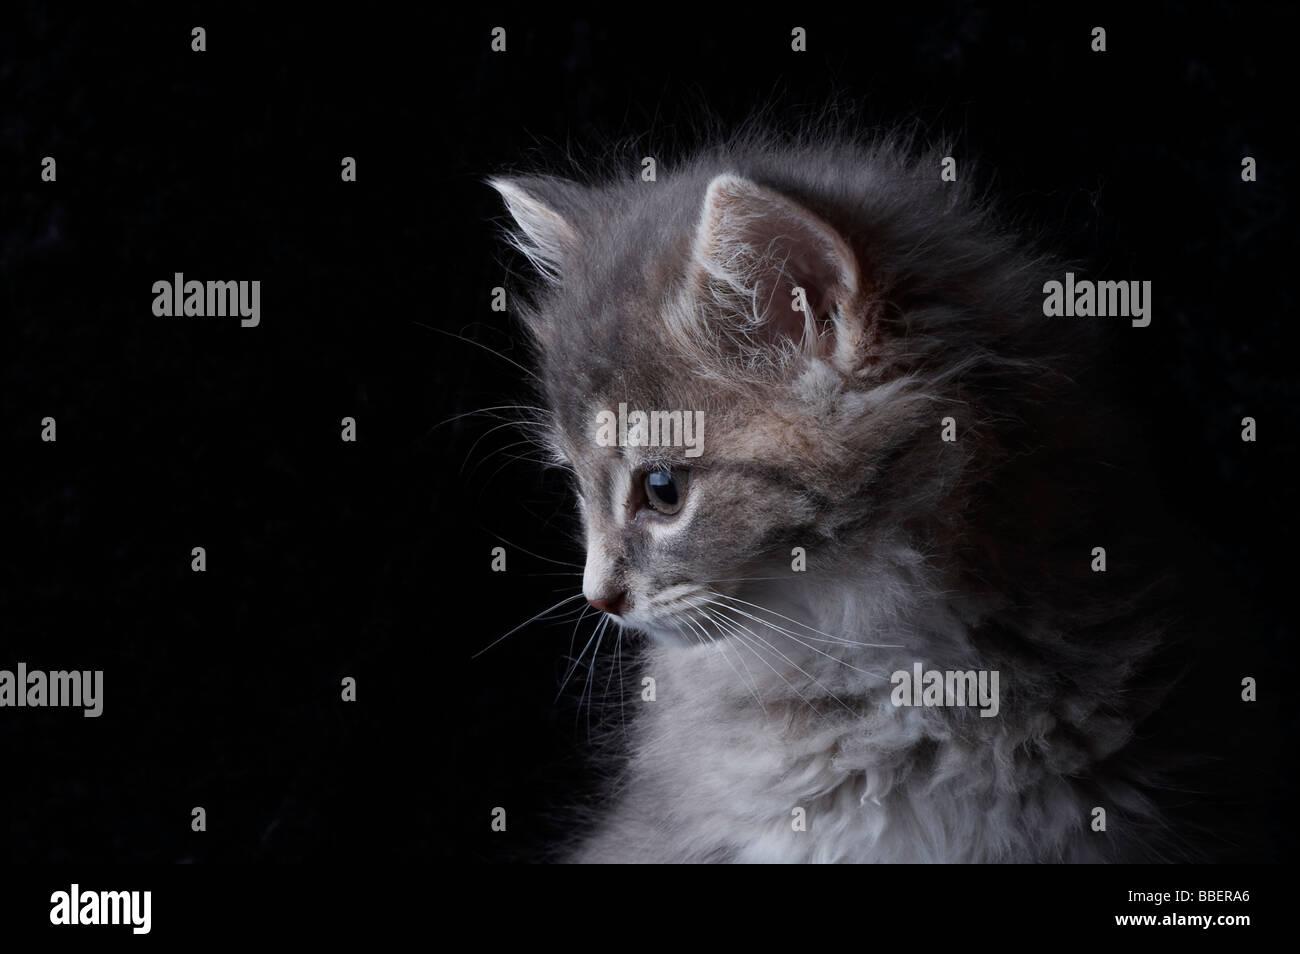 Fluffy grey kitten on black background - Stock Image